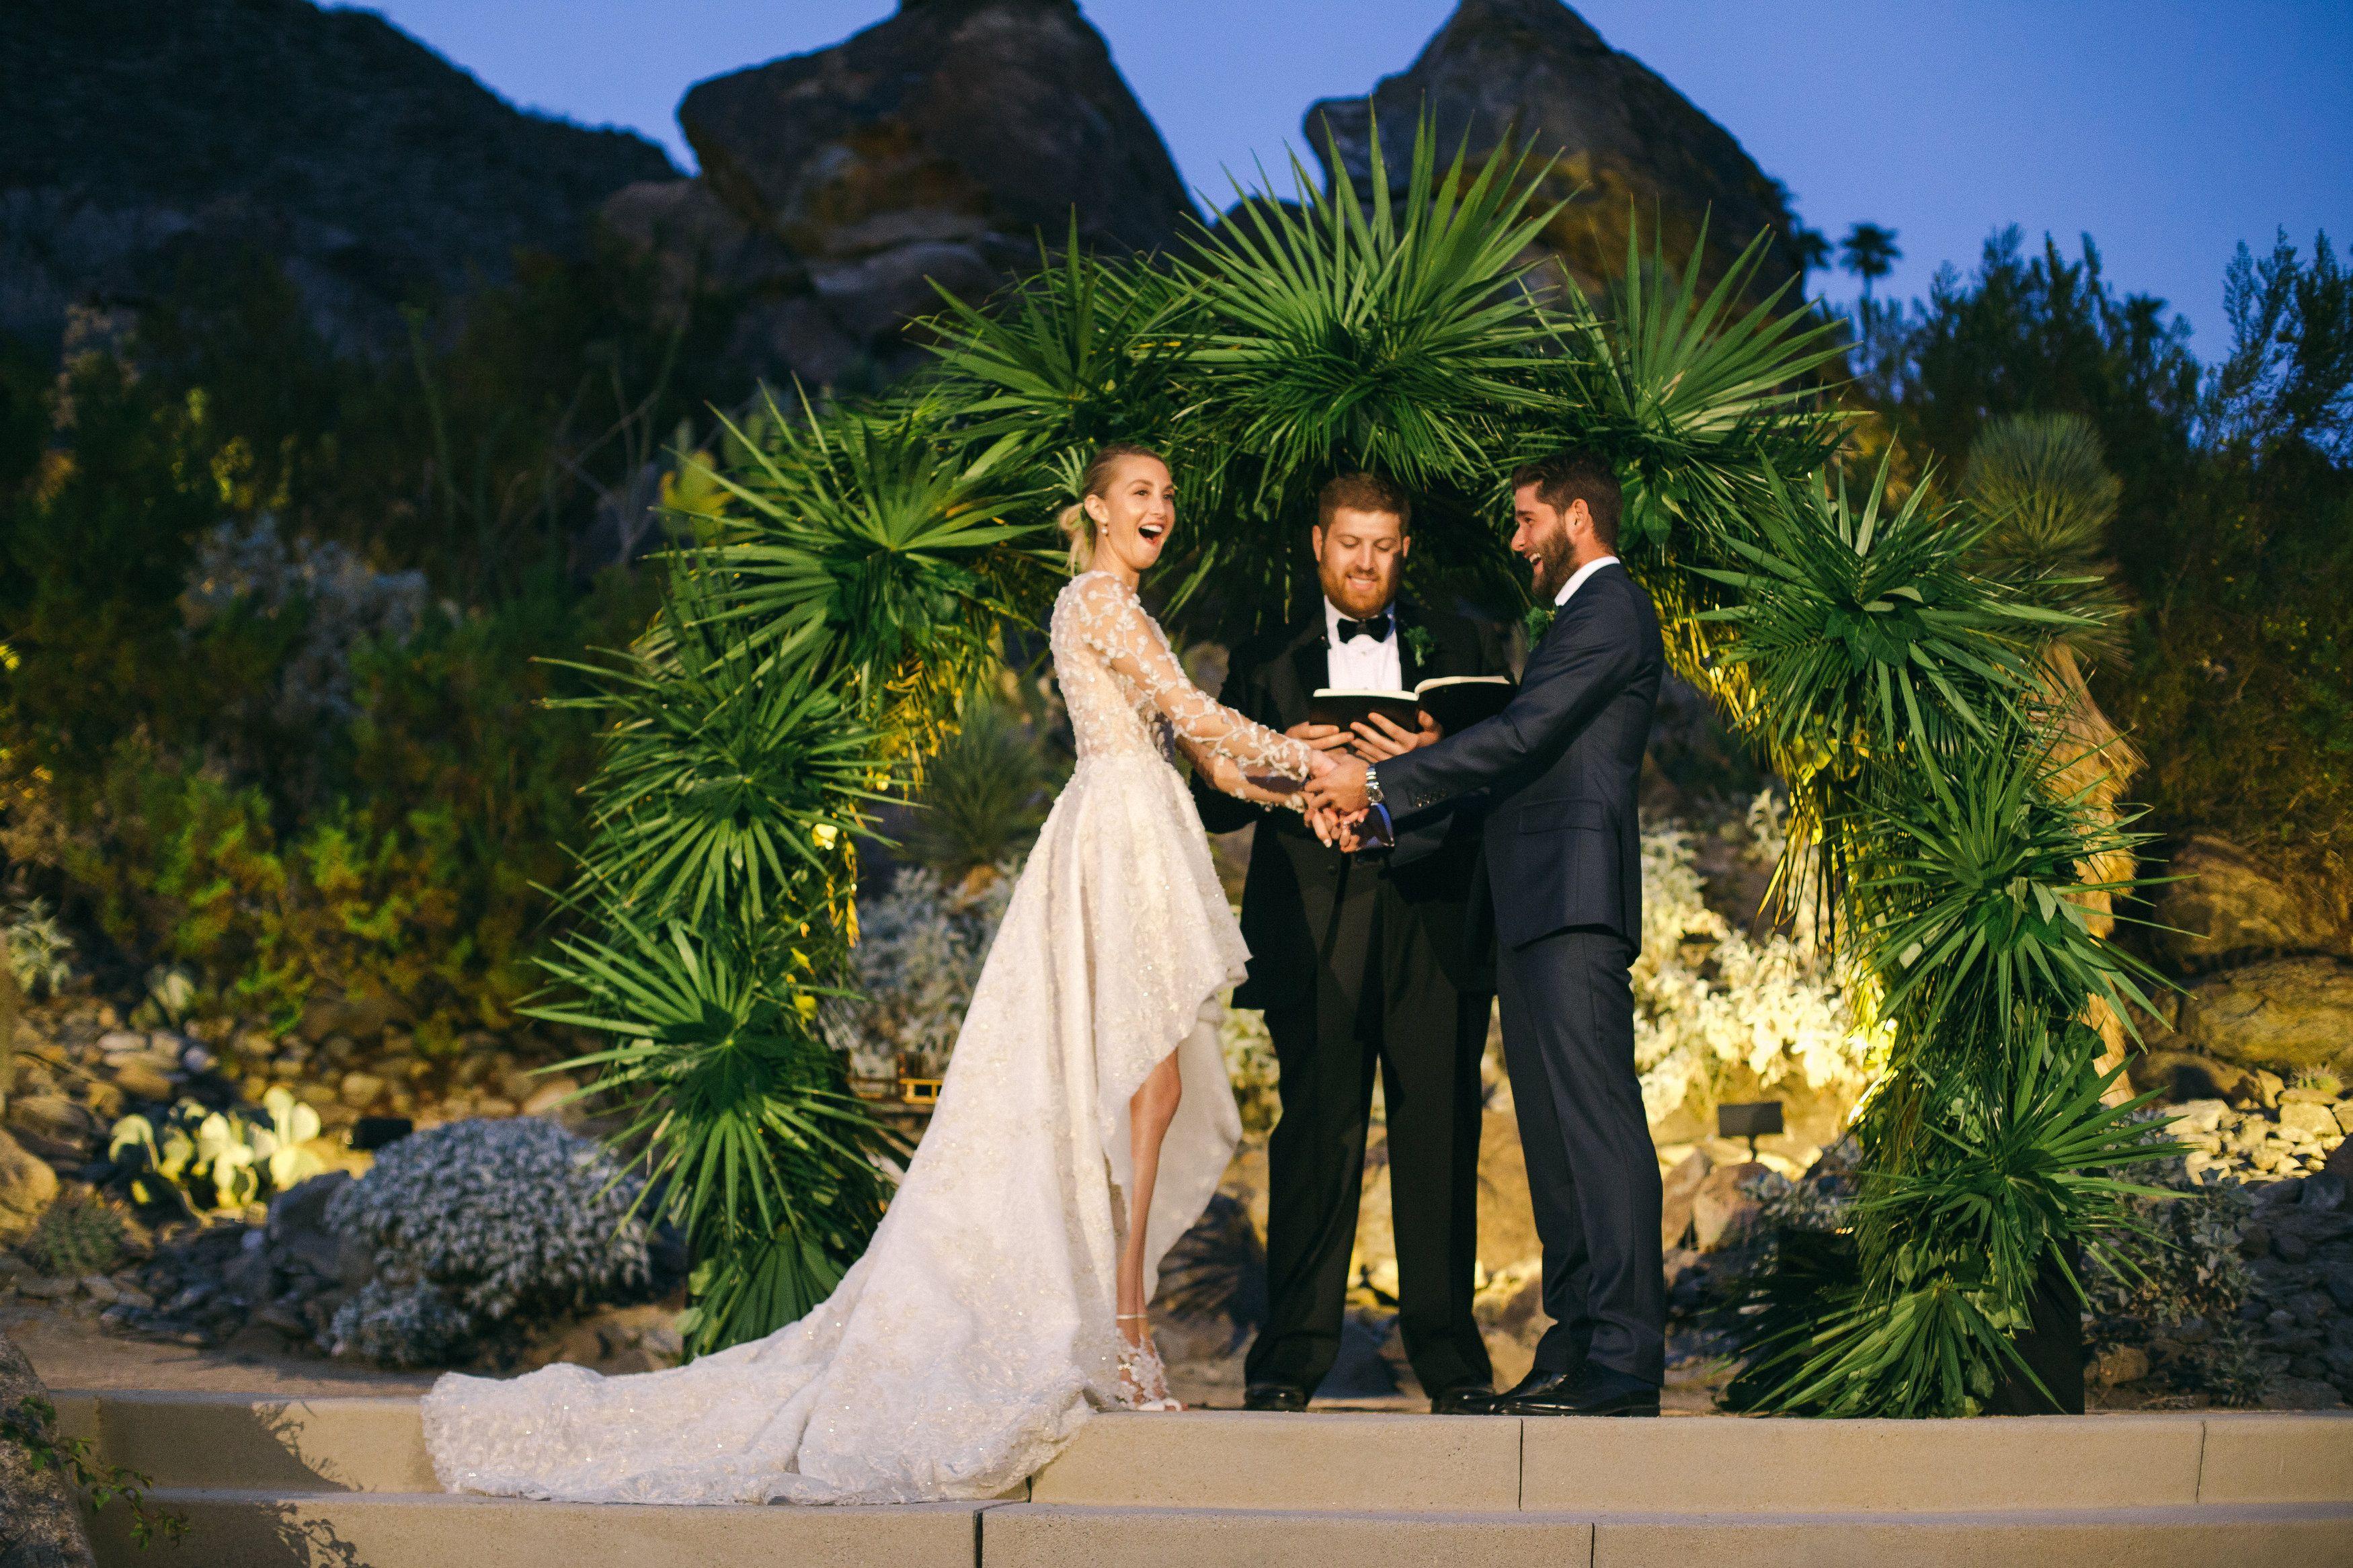 Our Wedding Ceremony Whitney Port Whitney Port Wedding Wedding Palm Springs Wedding